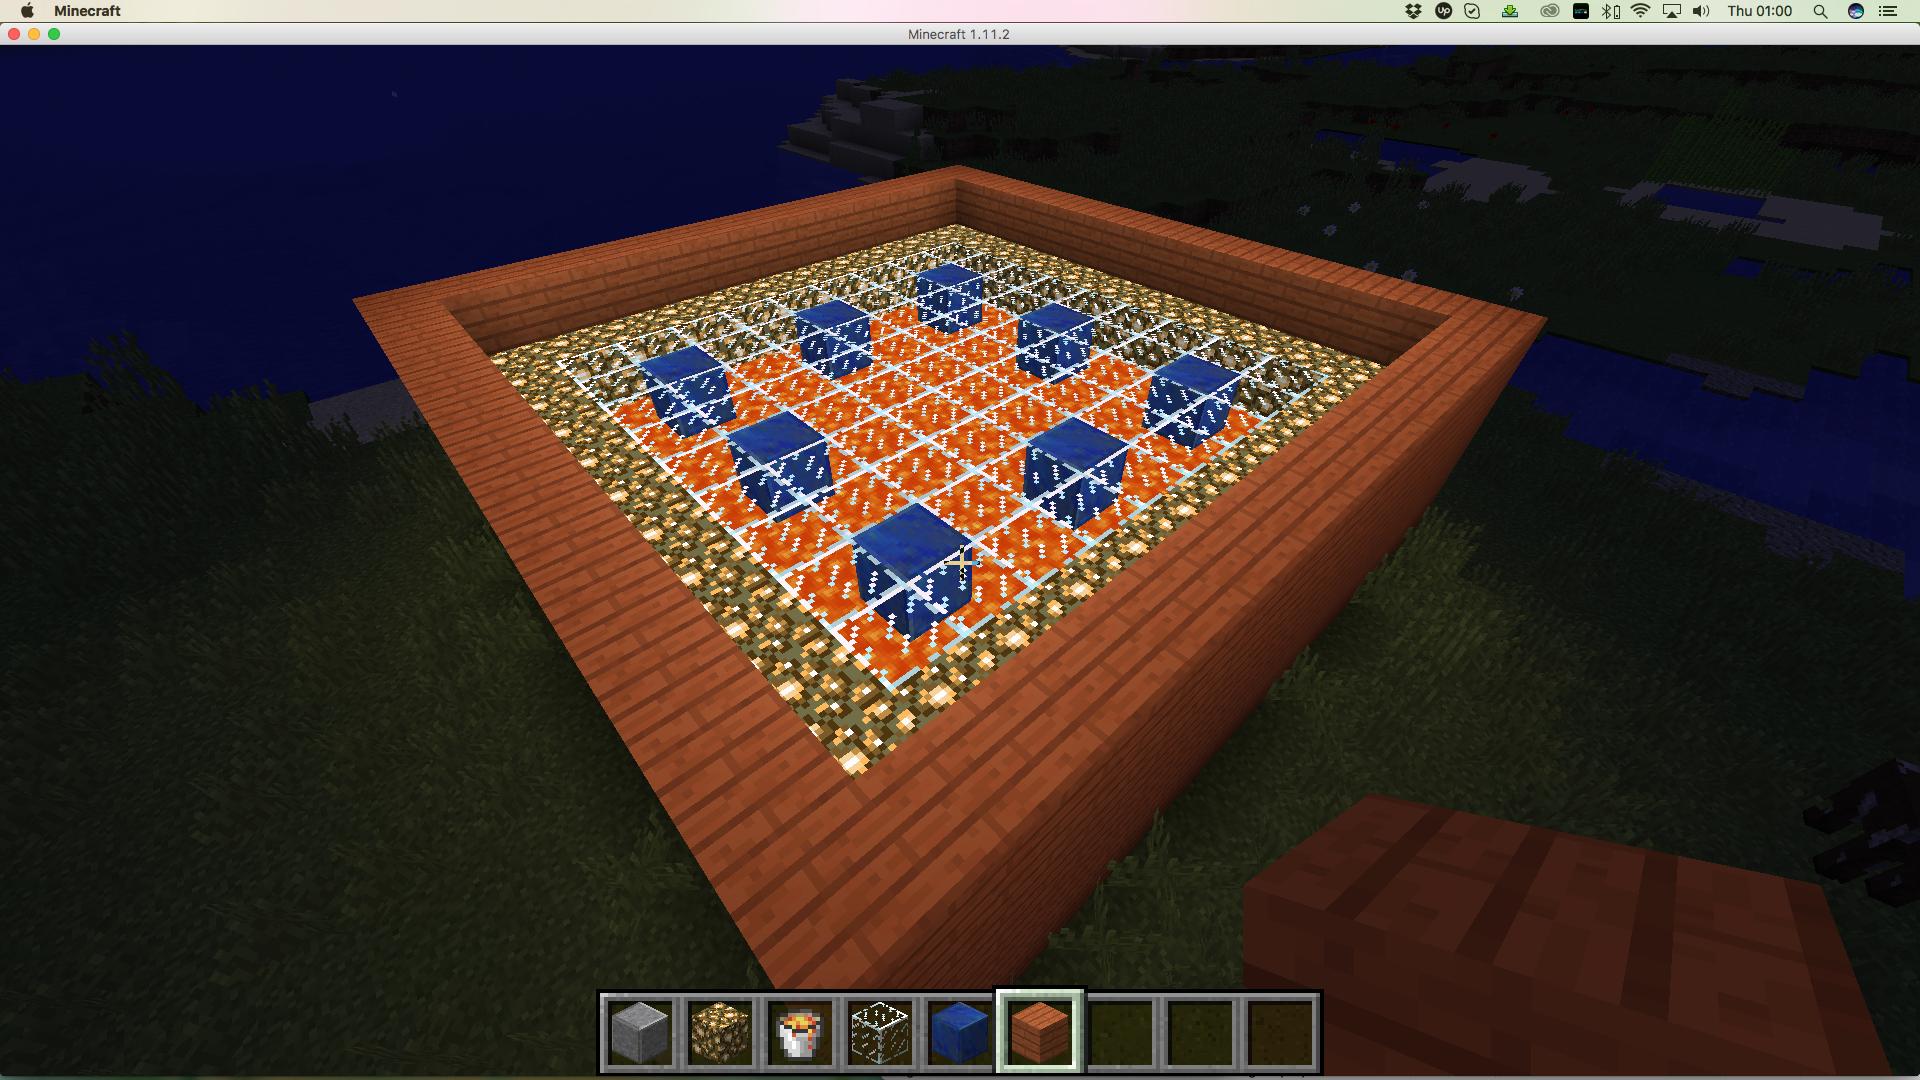 Building a Minecraft Luxury Valentine's Day Spa